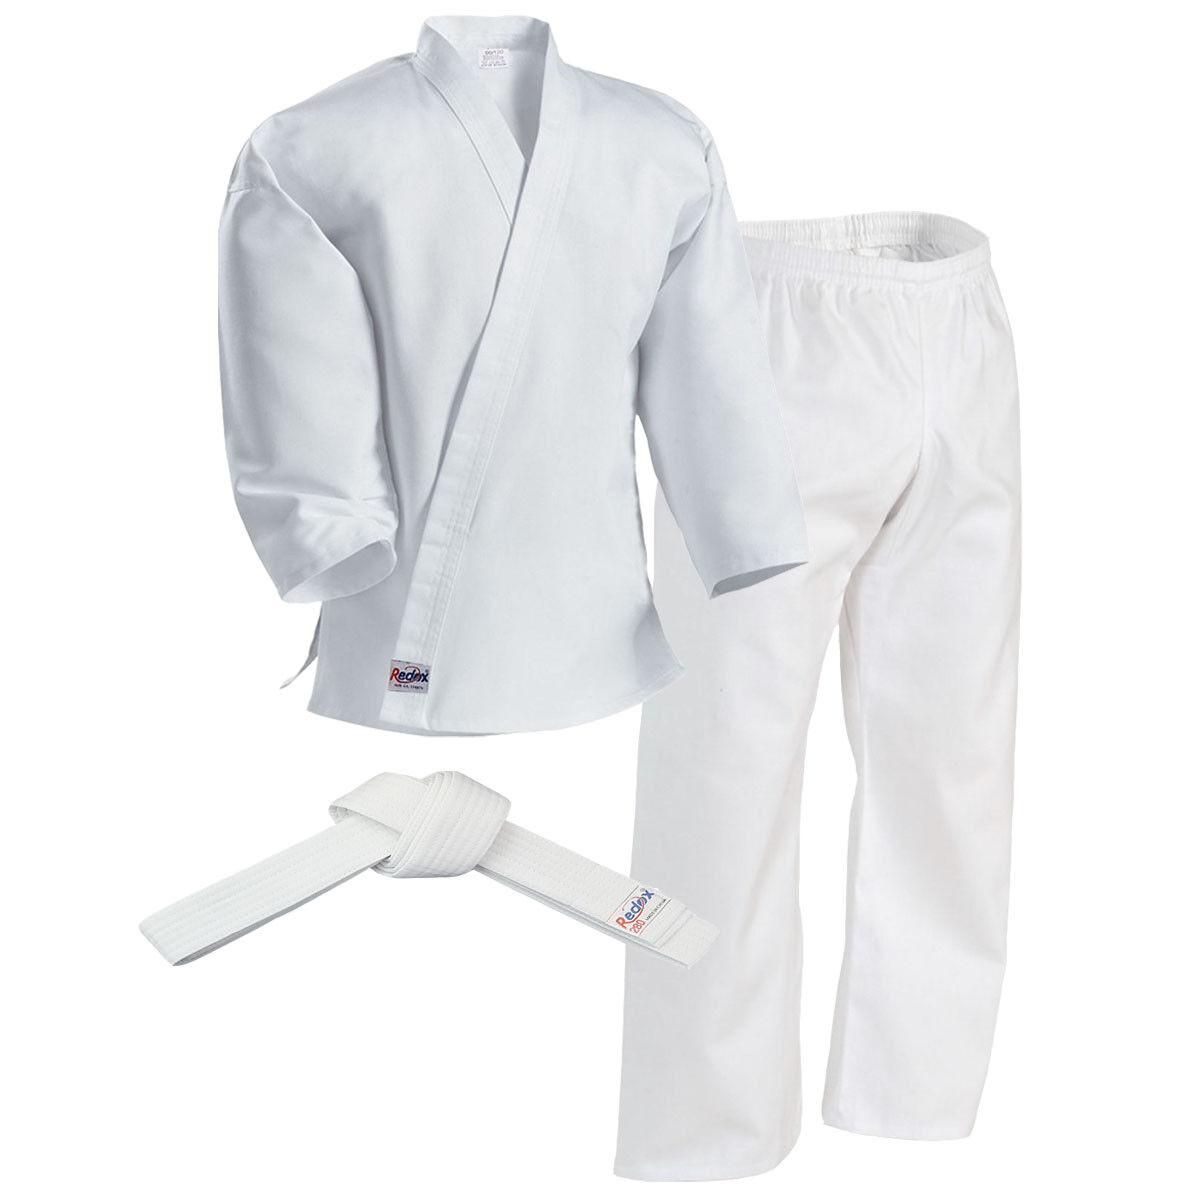 Kid KARATE Gi White Uniform, Taekwondo, size 0 (130cm) with white belt